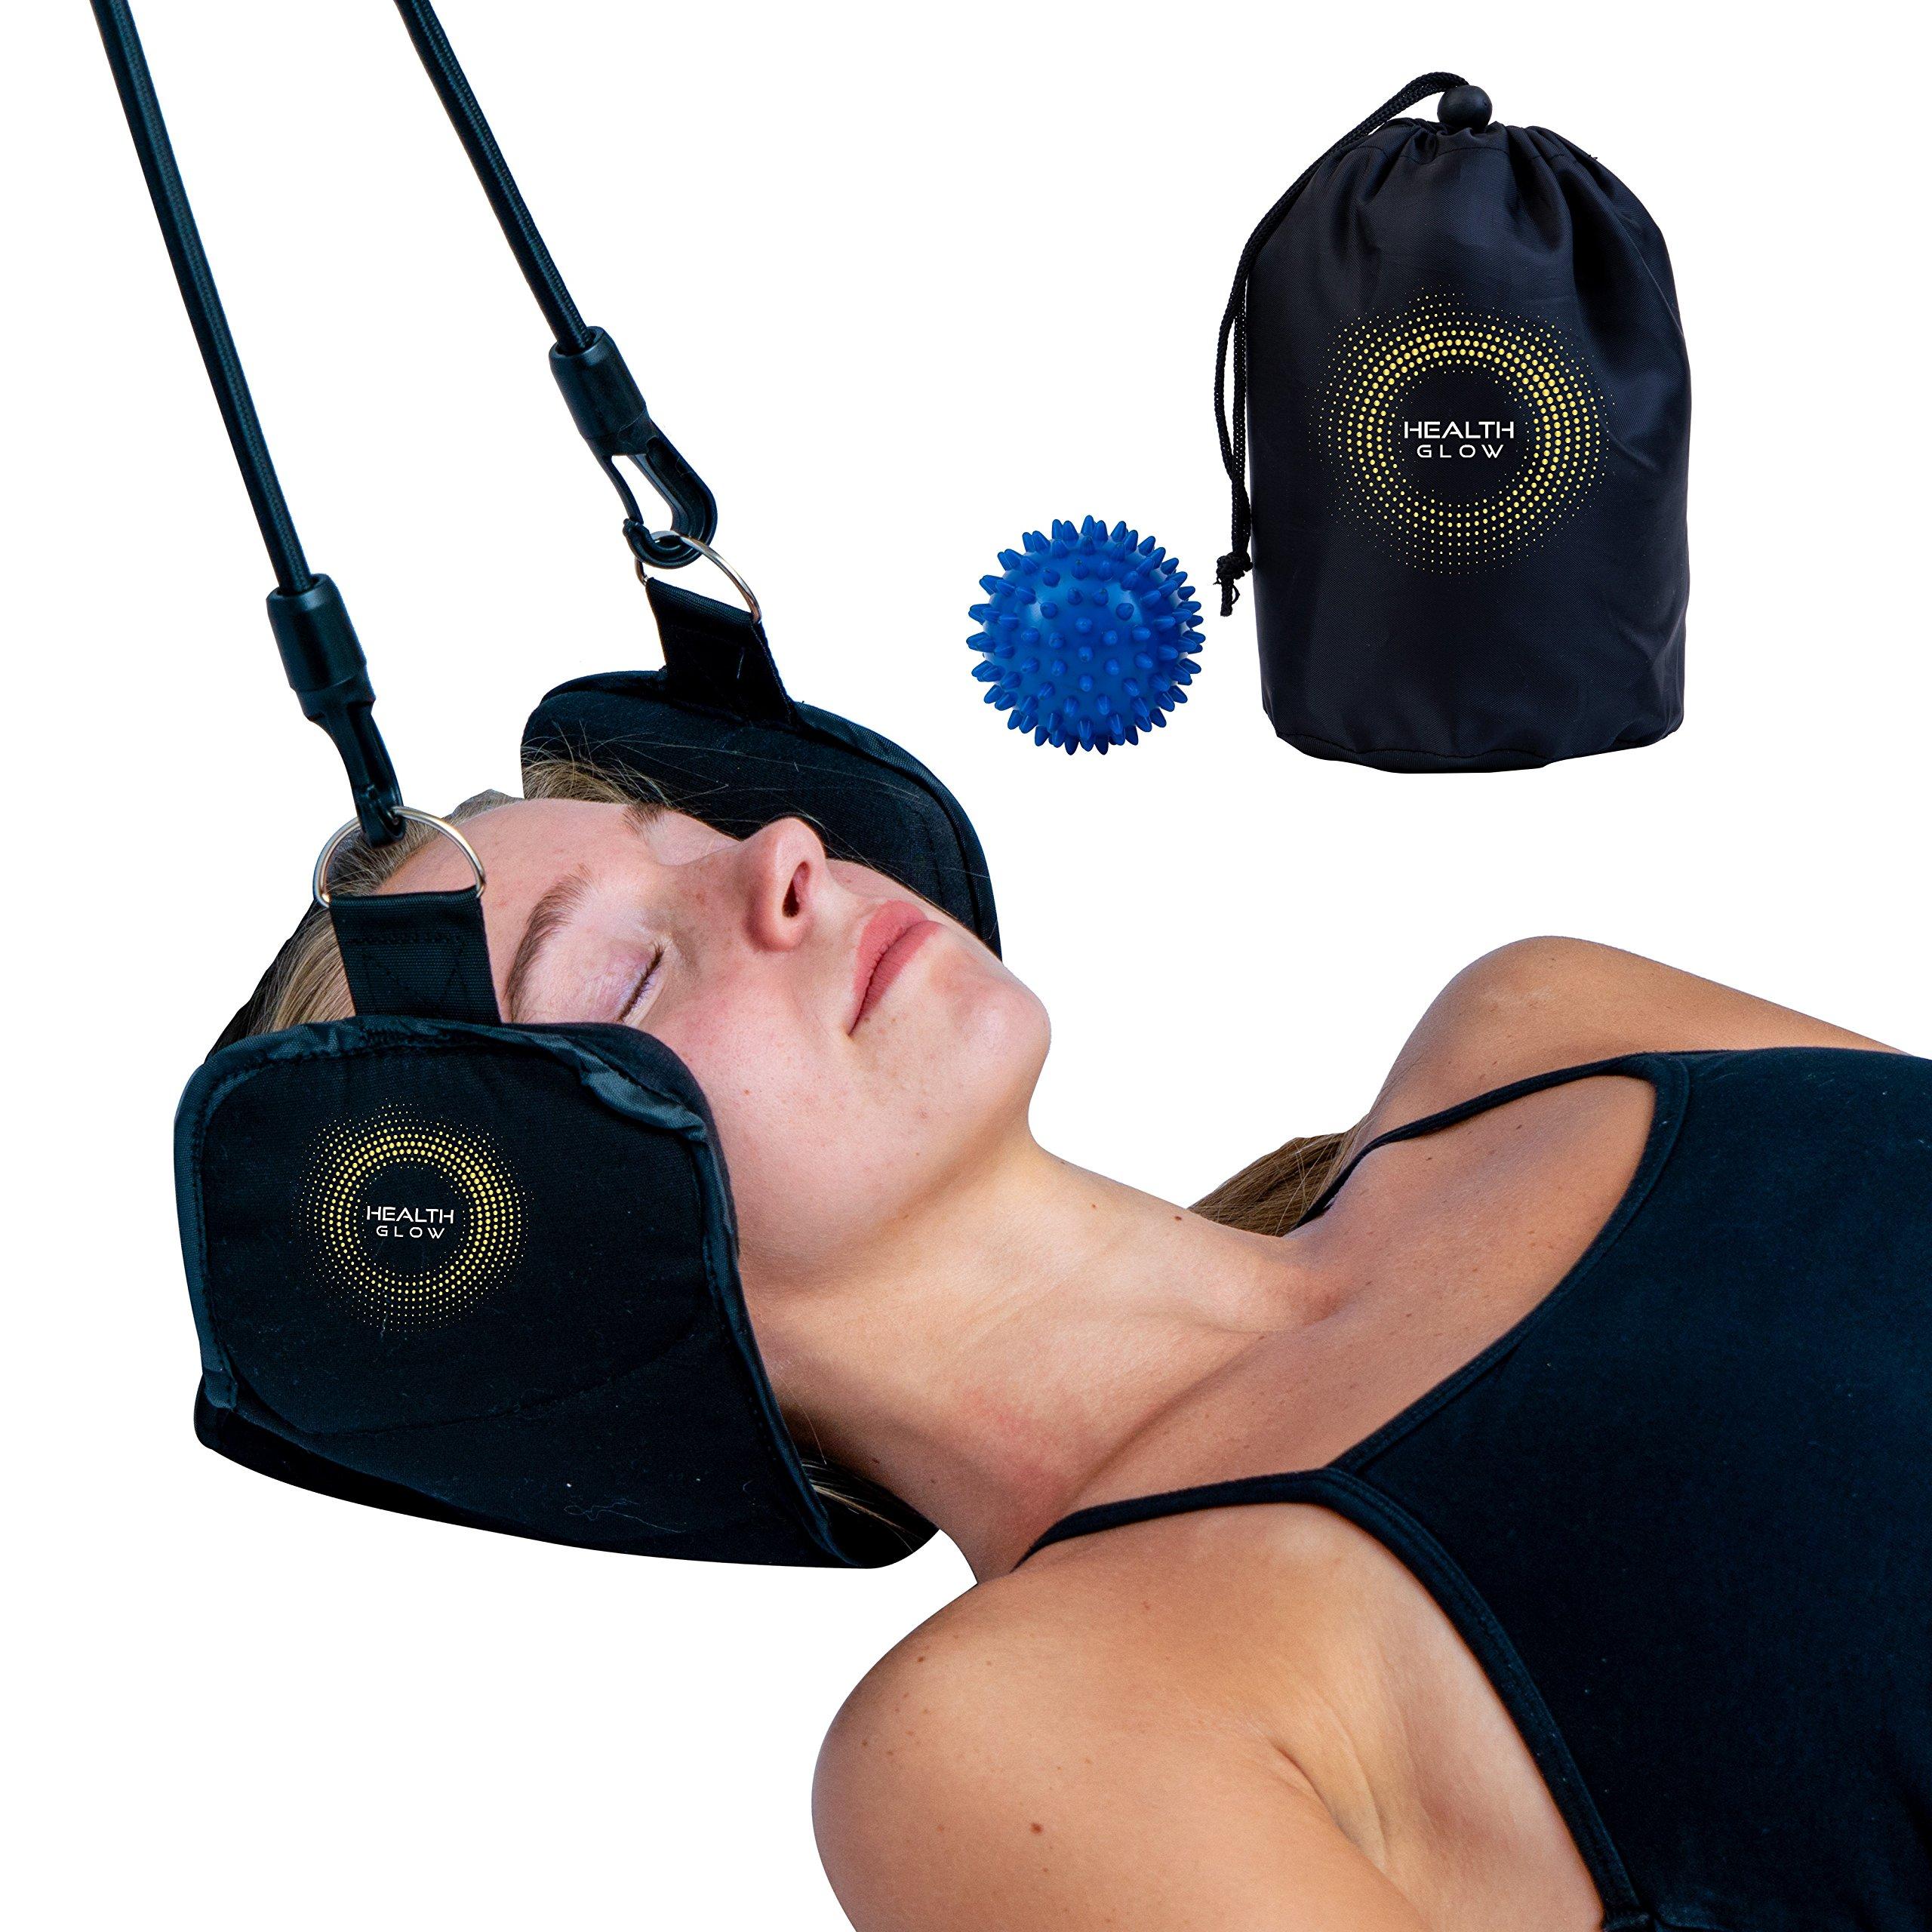 Premium Hammock for Neck Pain | Portable Cervical Traction Device | Neck Pain Relief | Bonus Massage Ball